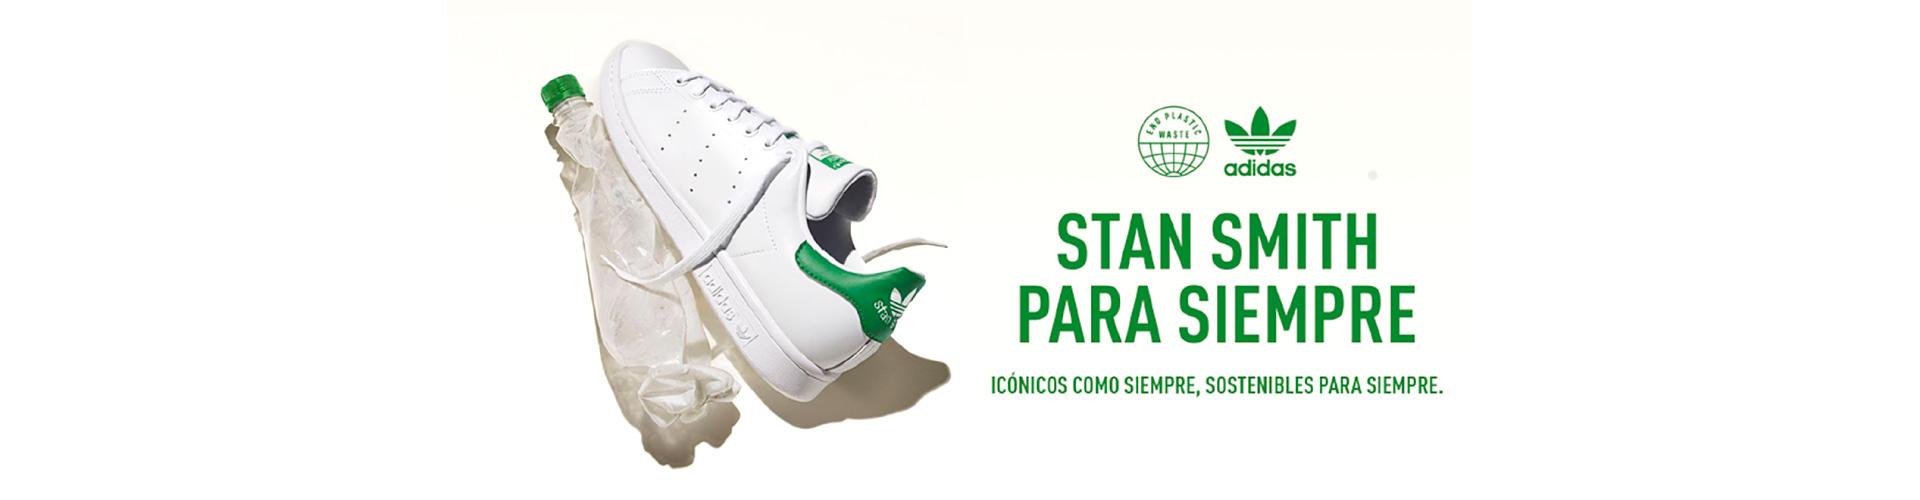 Banner Adidas Stan Smith